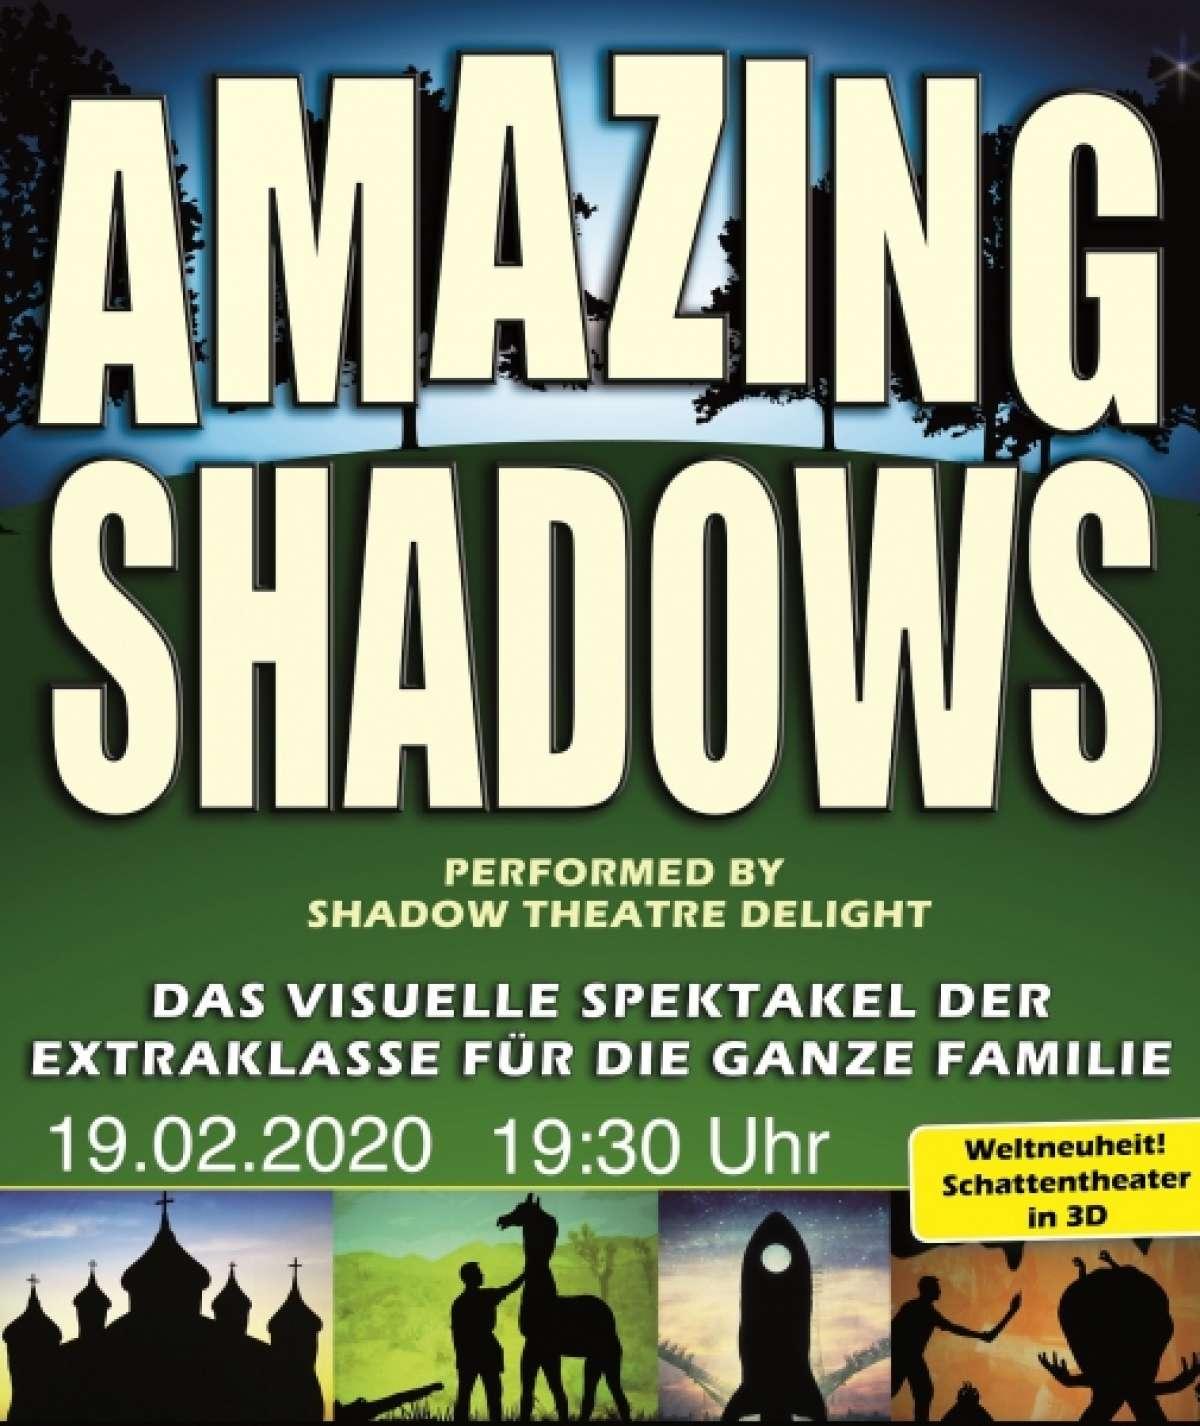 Amazing Shadows - Shadow Theatre Delight - Stadthalle  - Holzminden